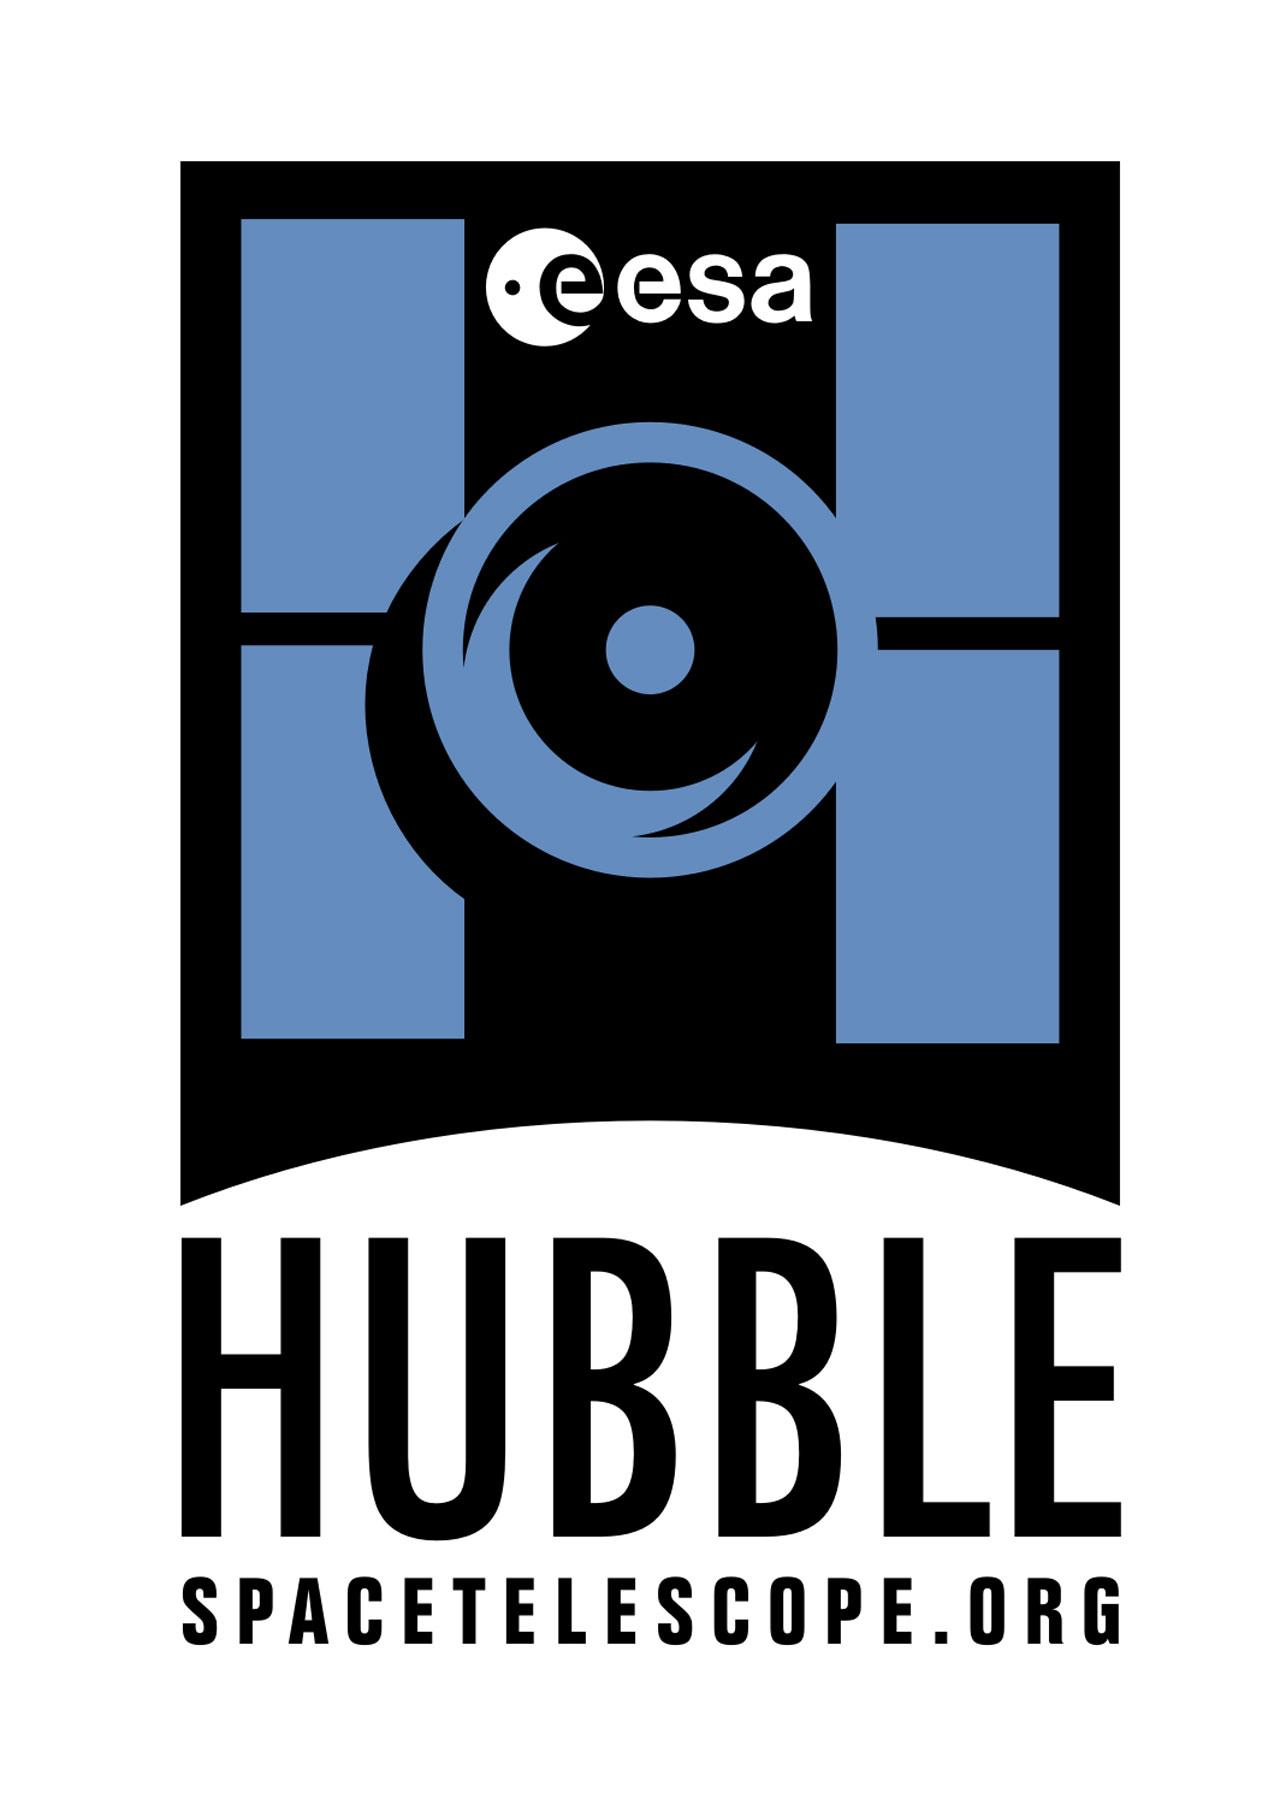 european space agency logo wwwpixsharkcom images